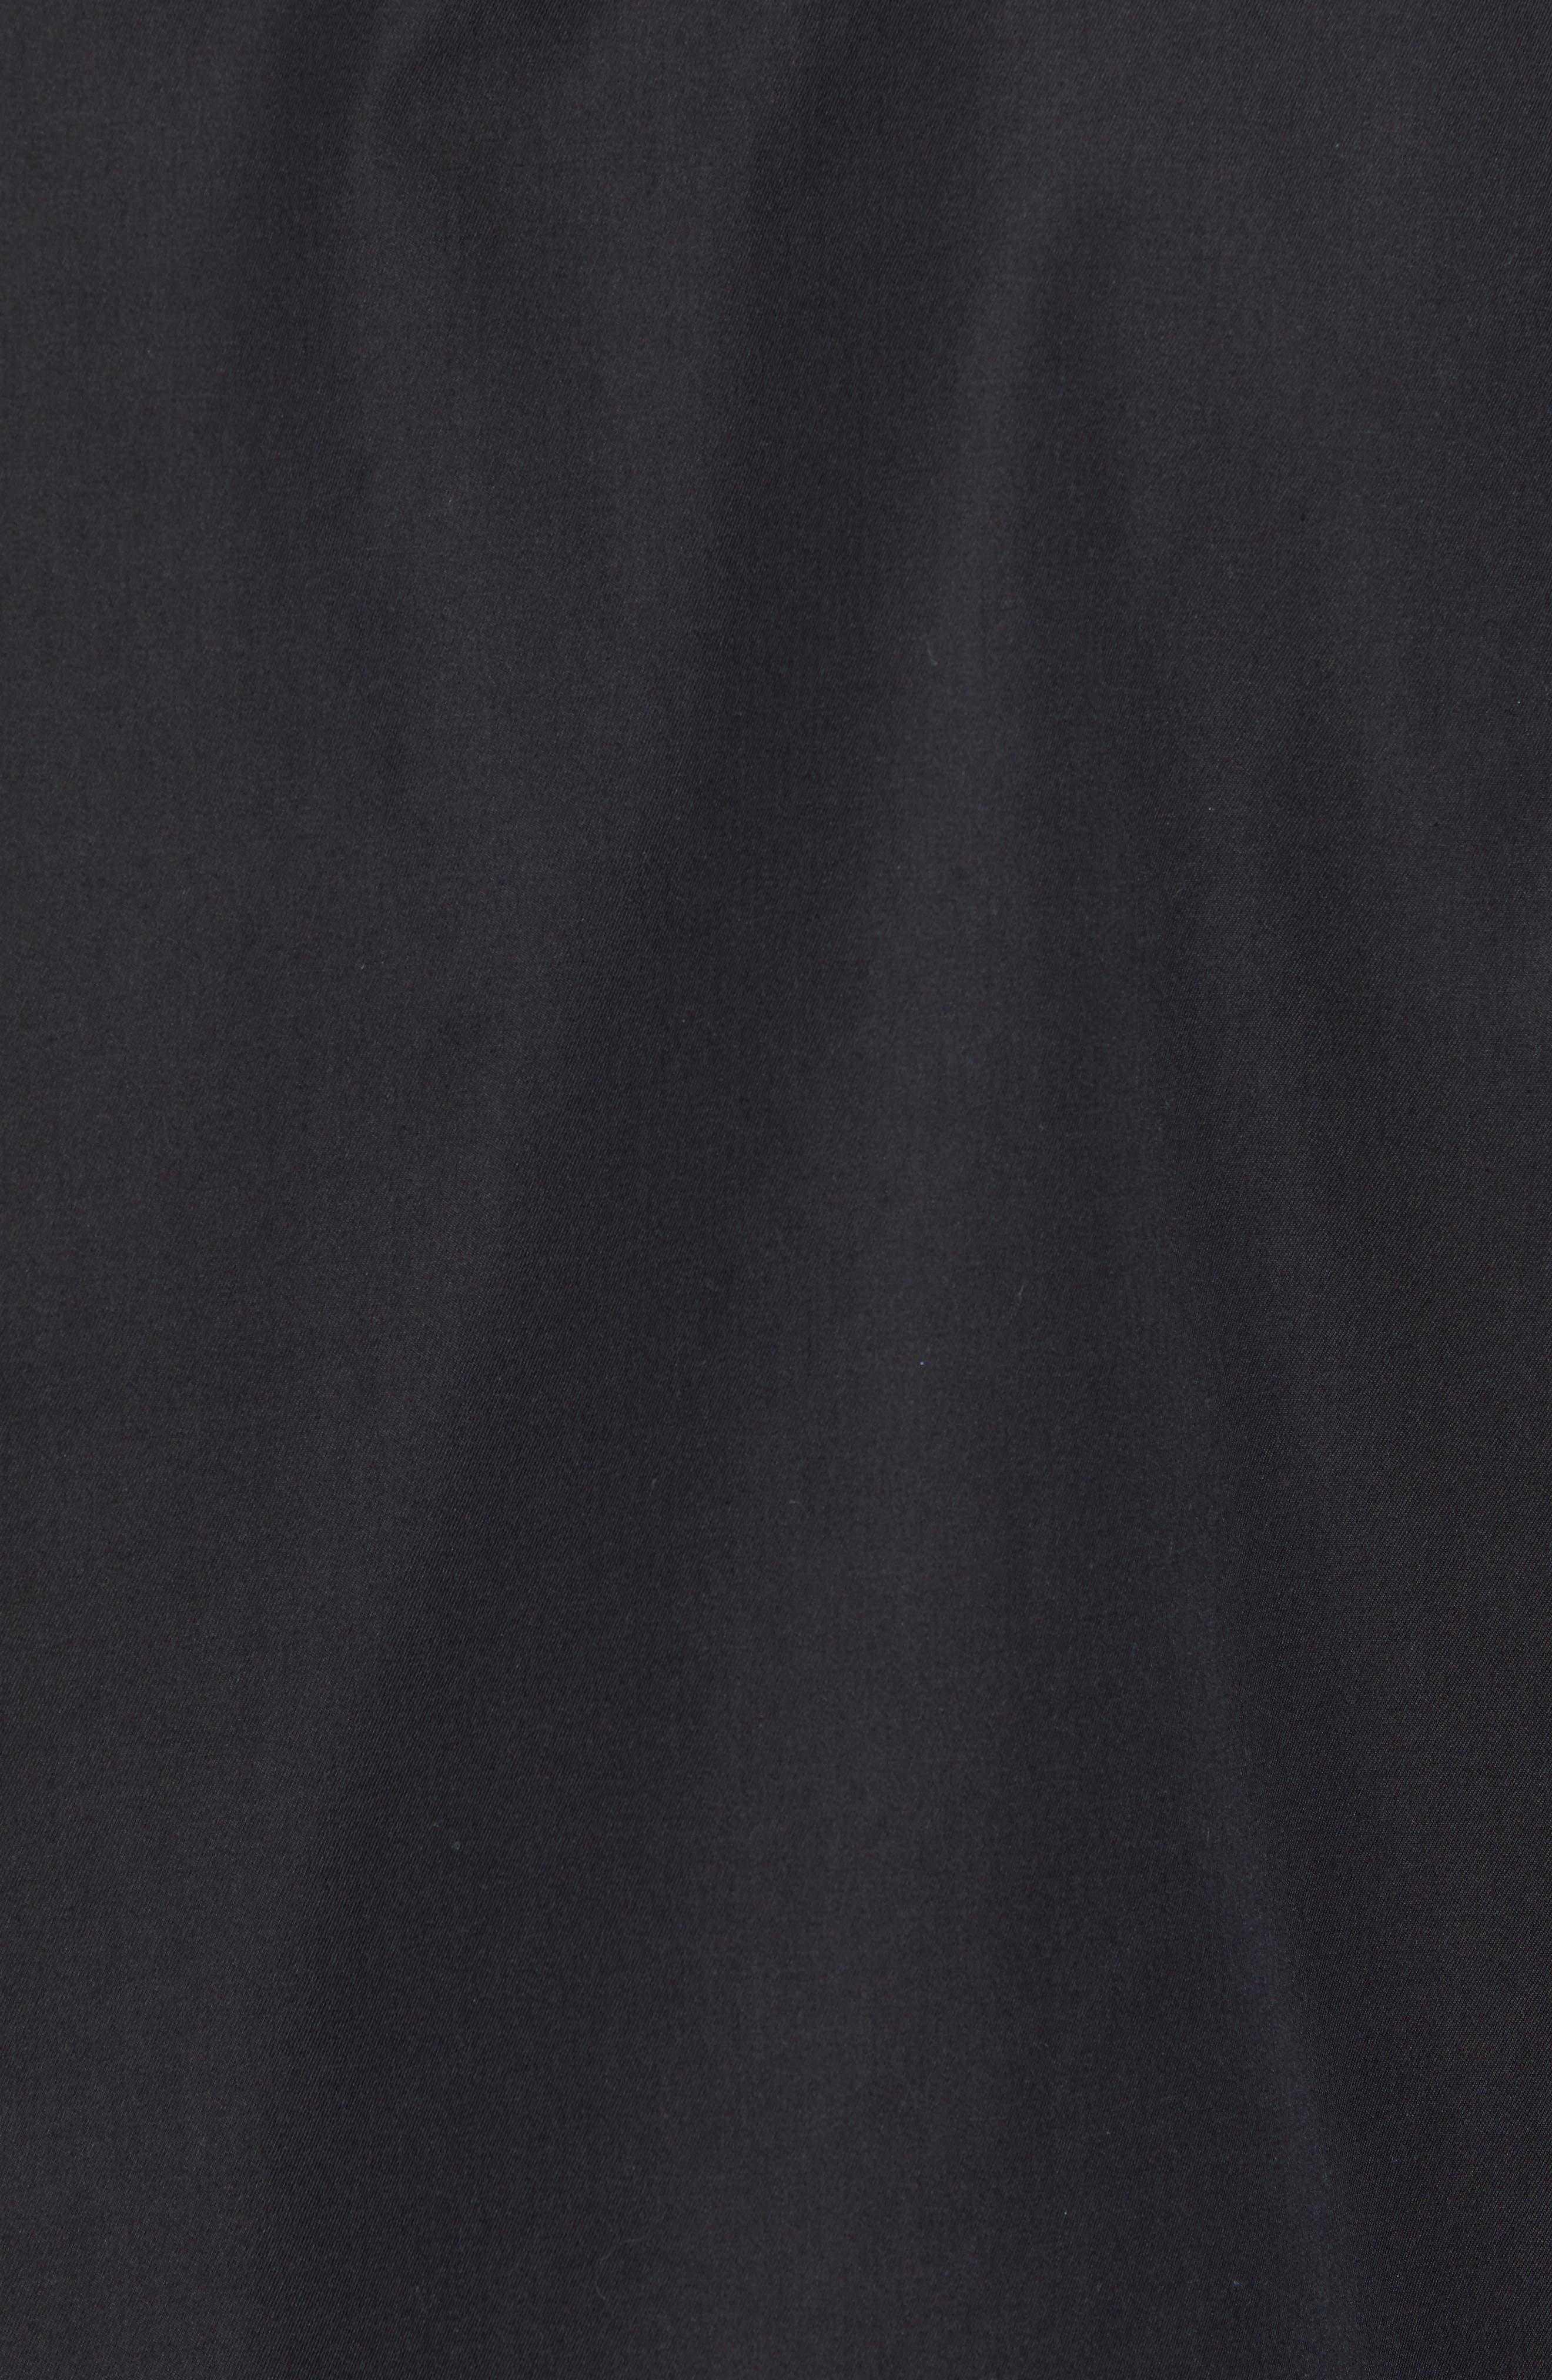 Regular Fit Jacket,                             Alternate thumbnail 6, color,                             001